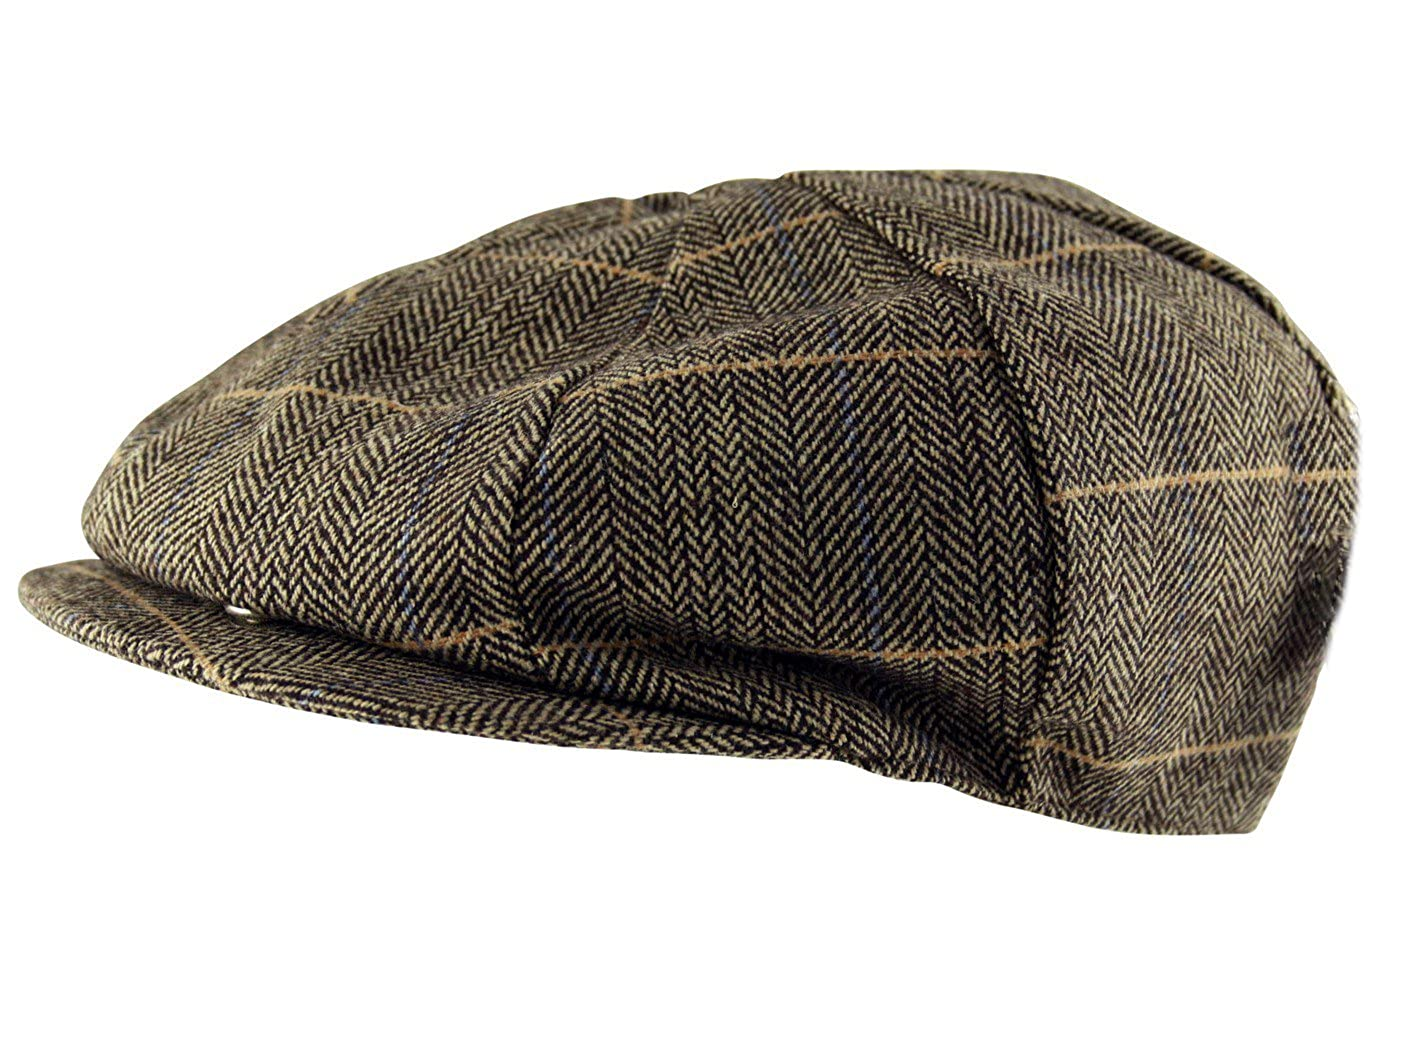 4c40f86868b Itzu Hats Newsboy Gatsby Flat Cap Check Herringbone in Brown